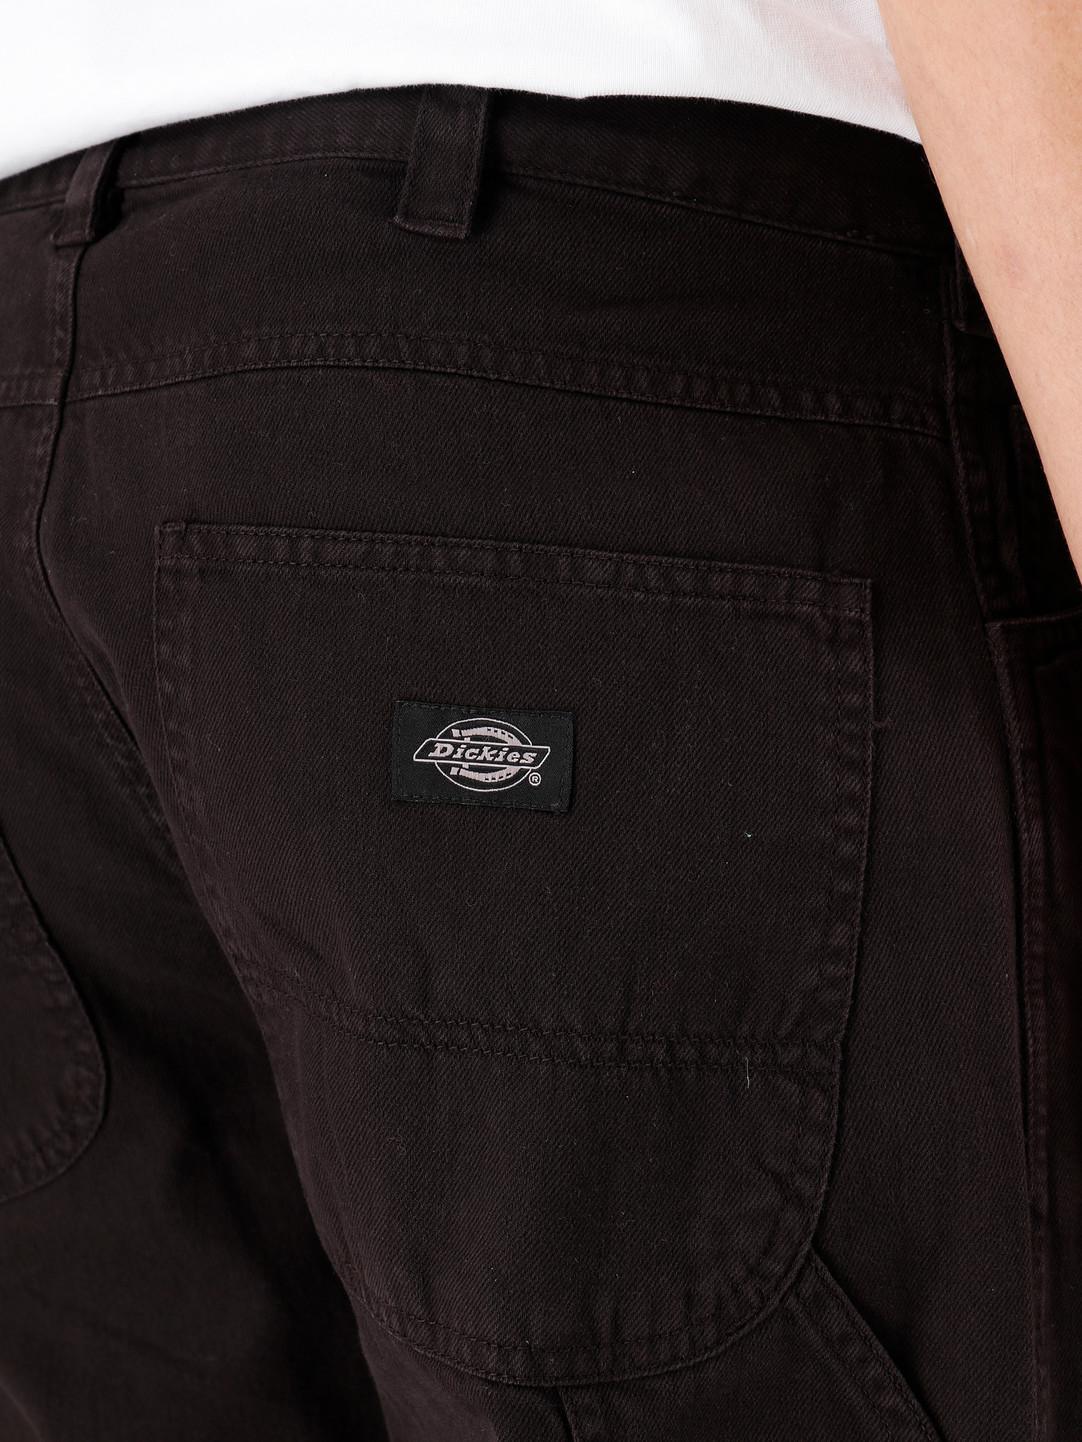 Dickies Dickies Fairdale 5 Pocket Carpenter Pant Black DK121172BLK1